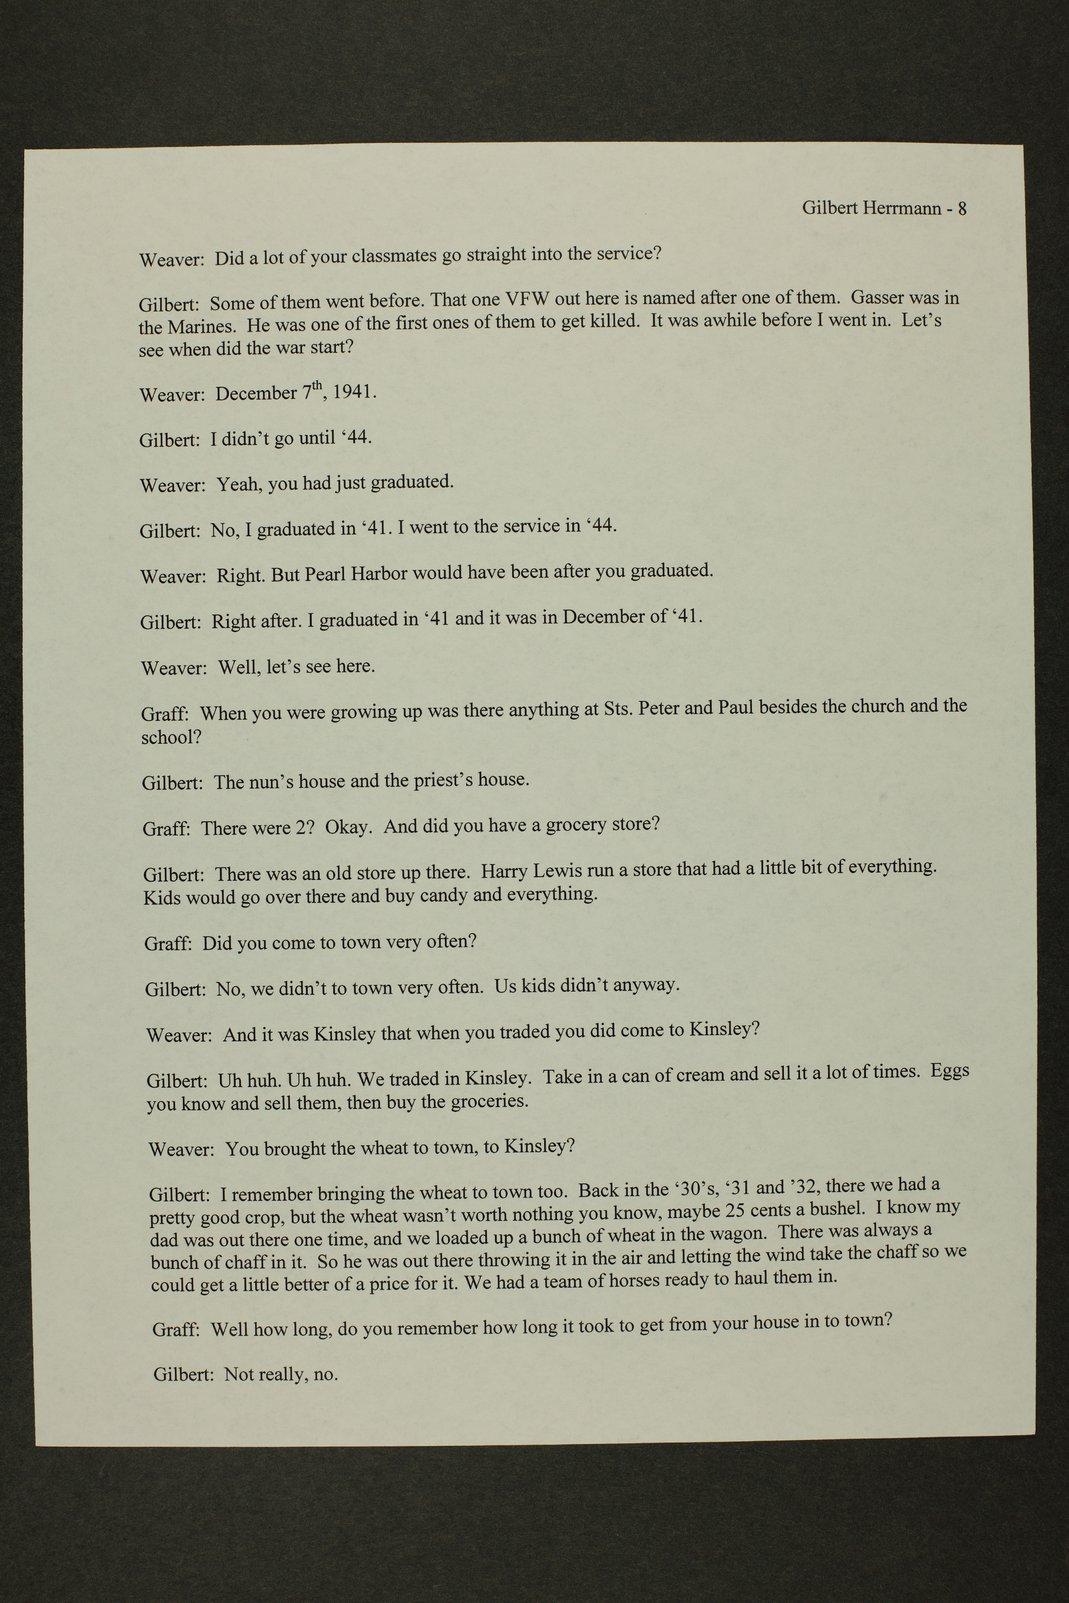 Gilbert Herrman interview, WWII oral history, Kinsley, Kansas - 8